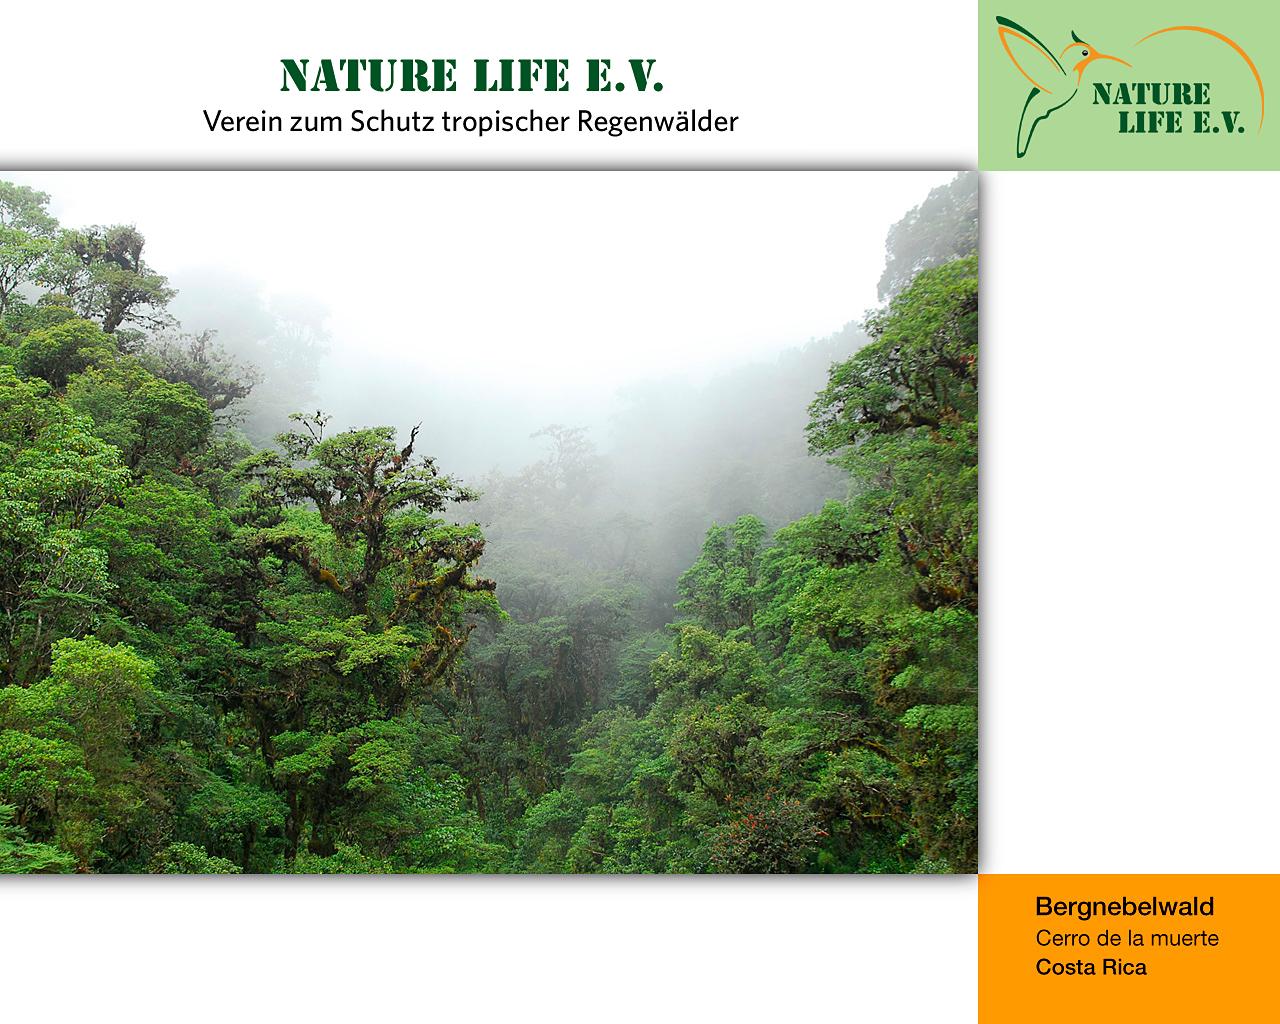 Bergnebelwald (Cerro de la muerte, Costa Rica) 1280 x 1024